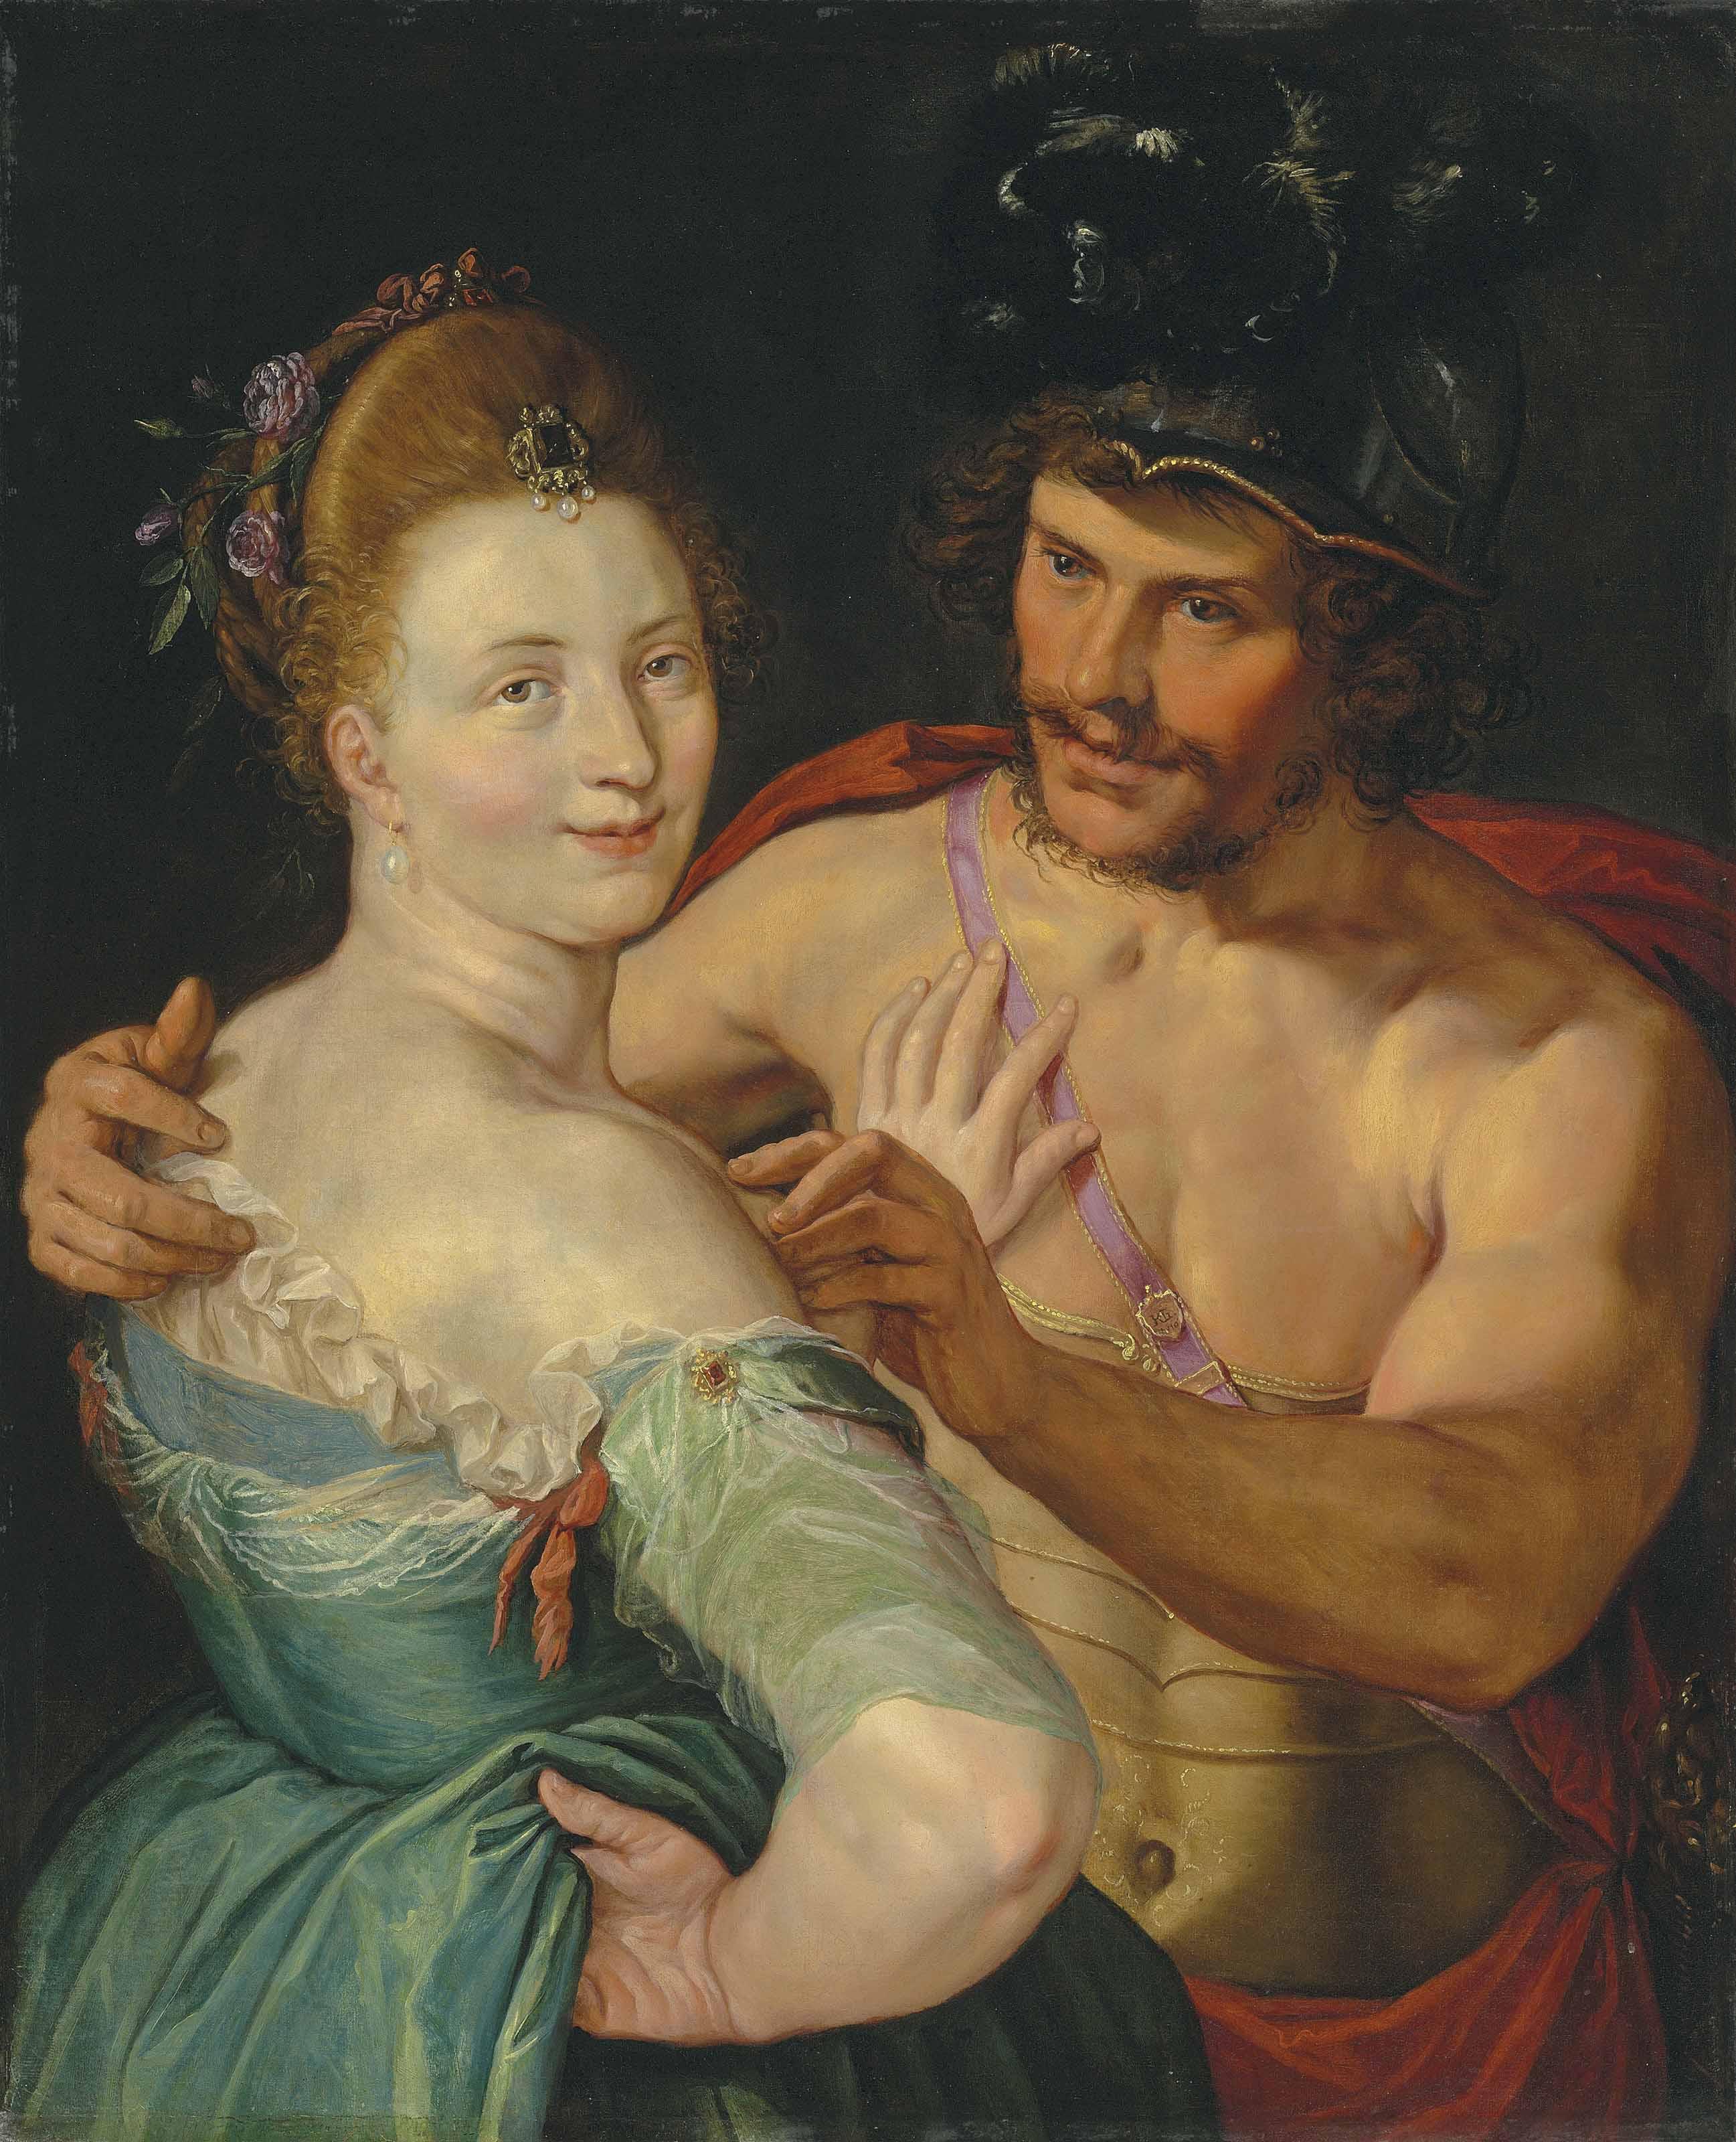 Hendrick Goltzius (Mülbracht 1558-1617 Haarlem)